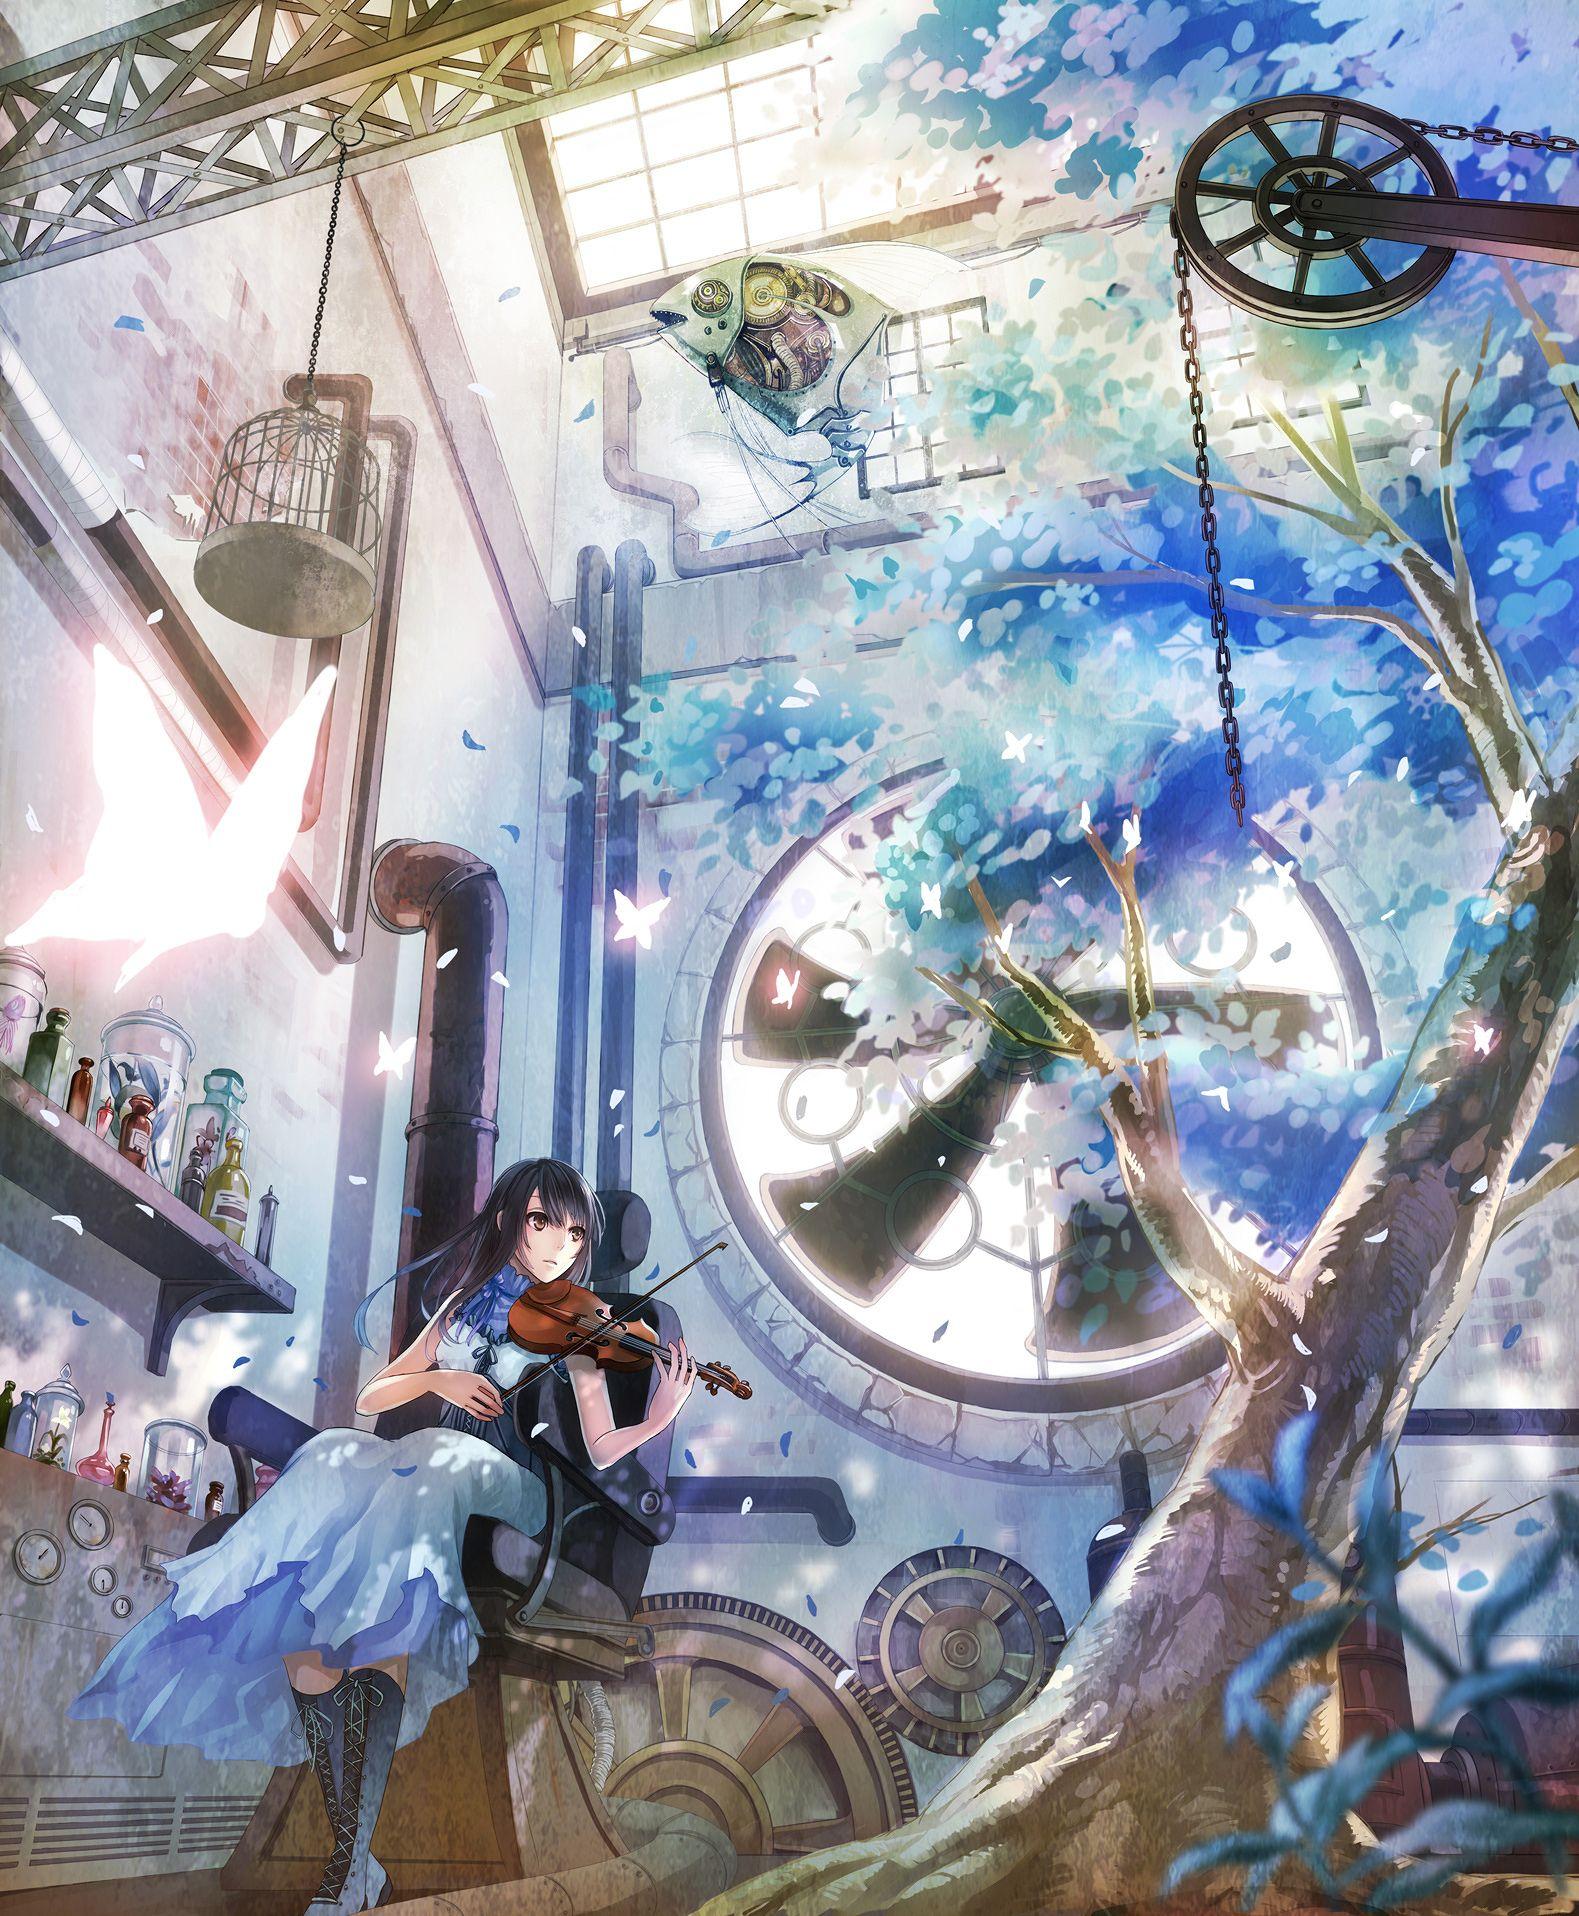 Univers Anime Manga: By Kirinosuke On Tokyo Otaku Mode β